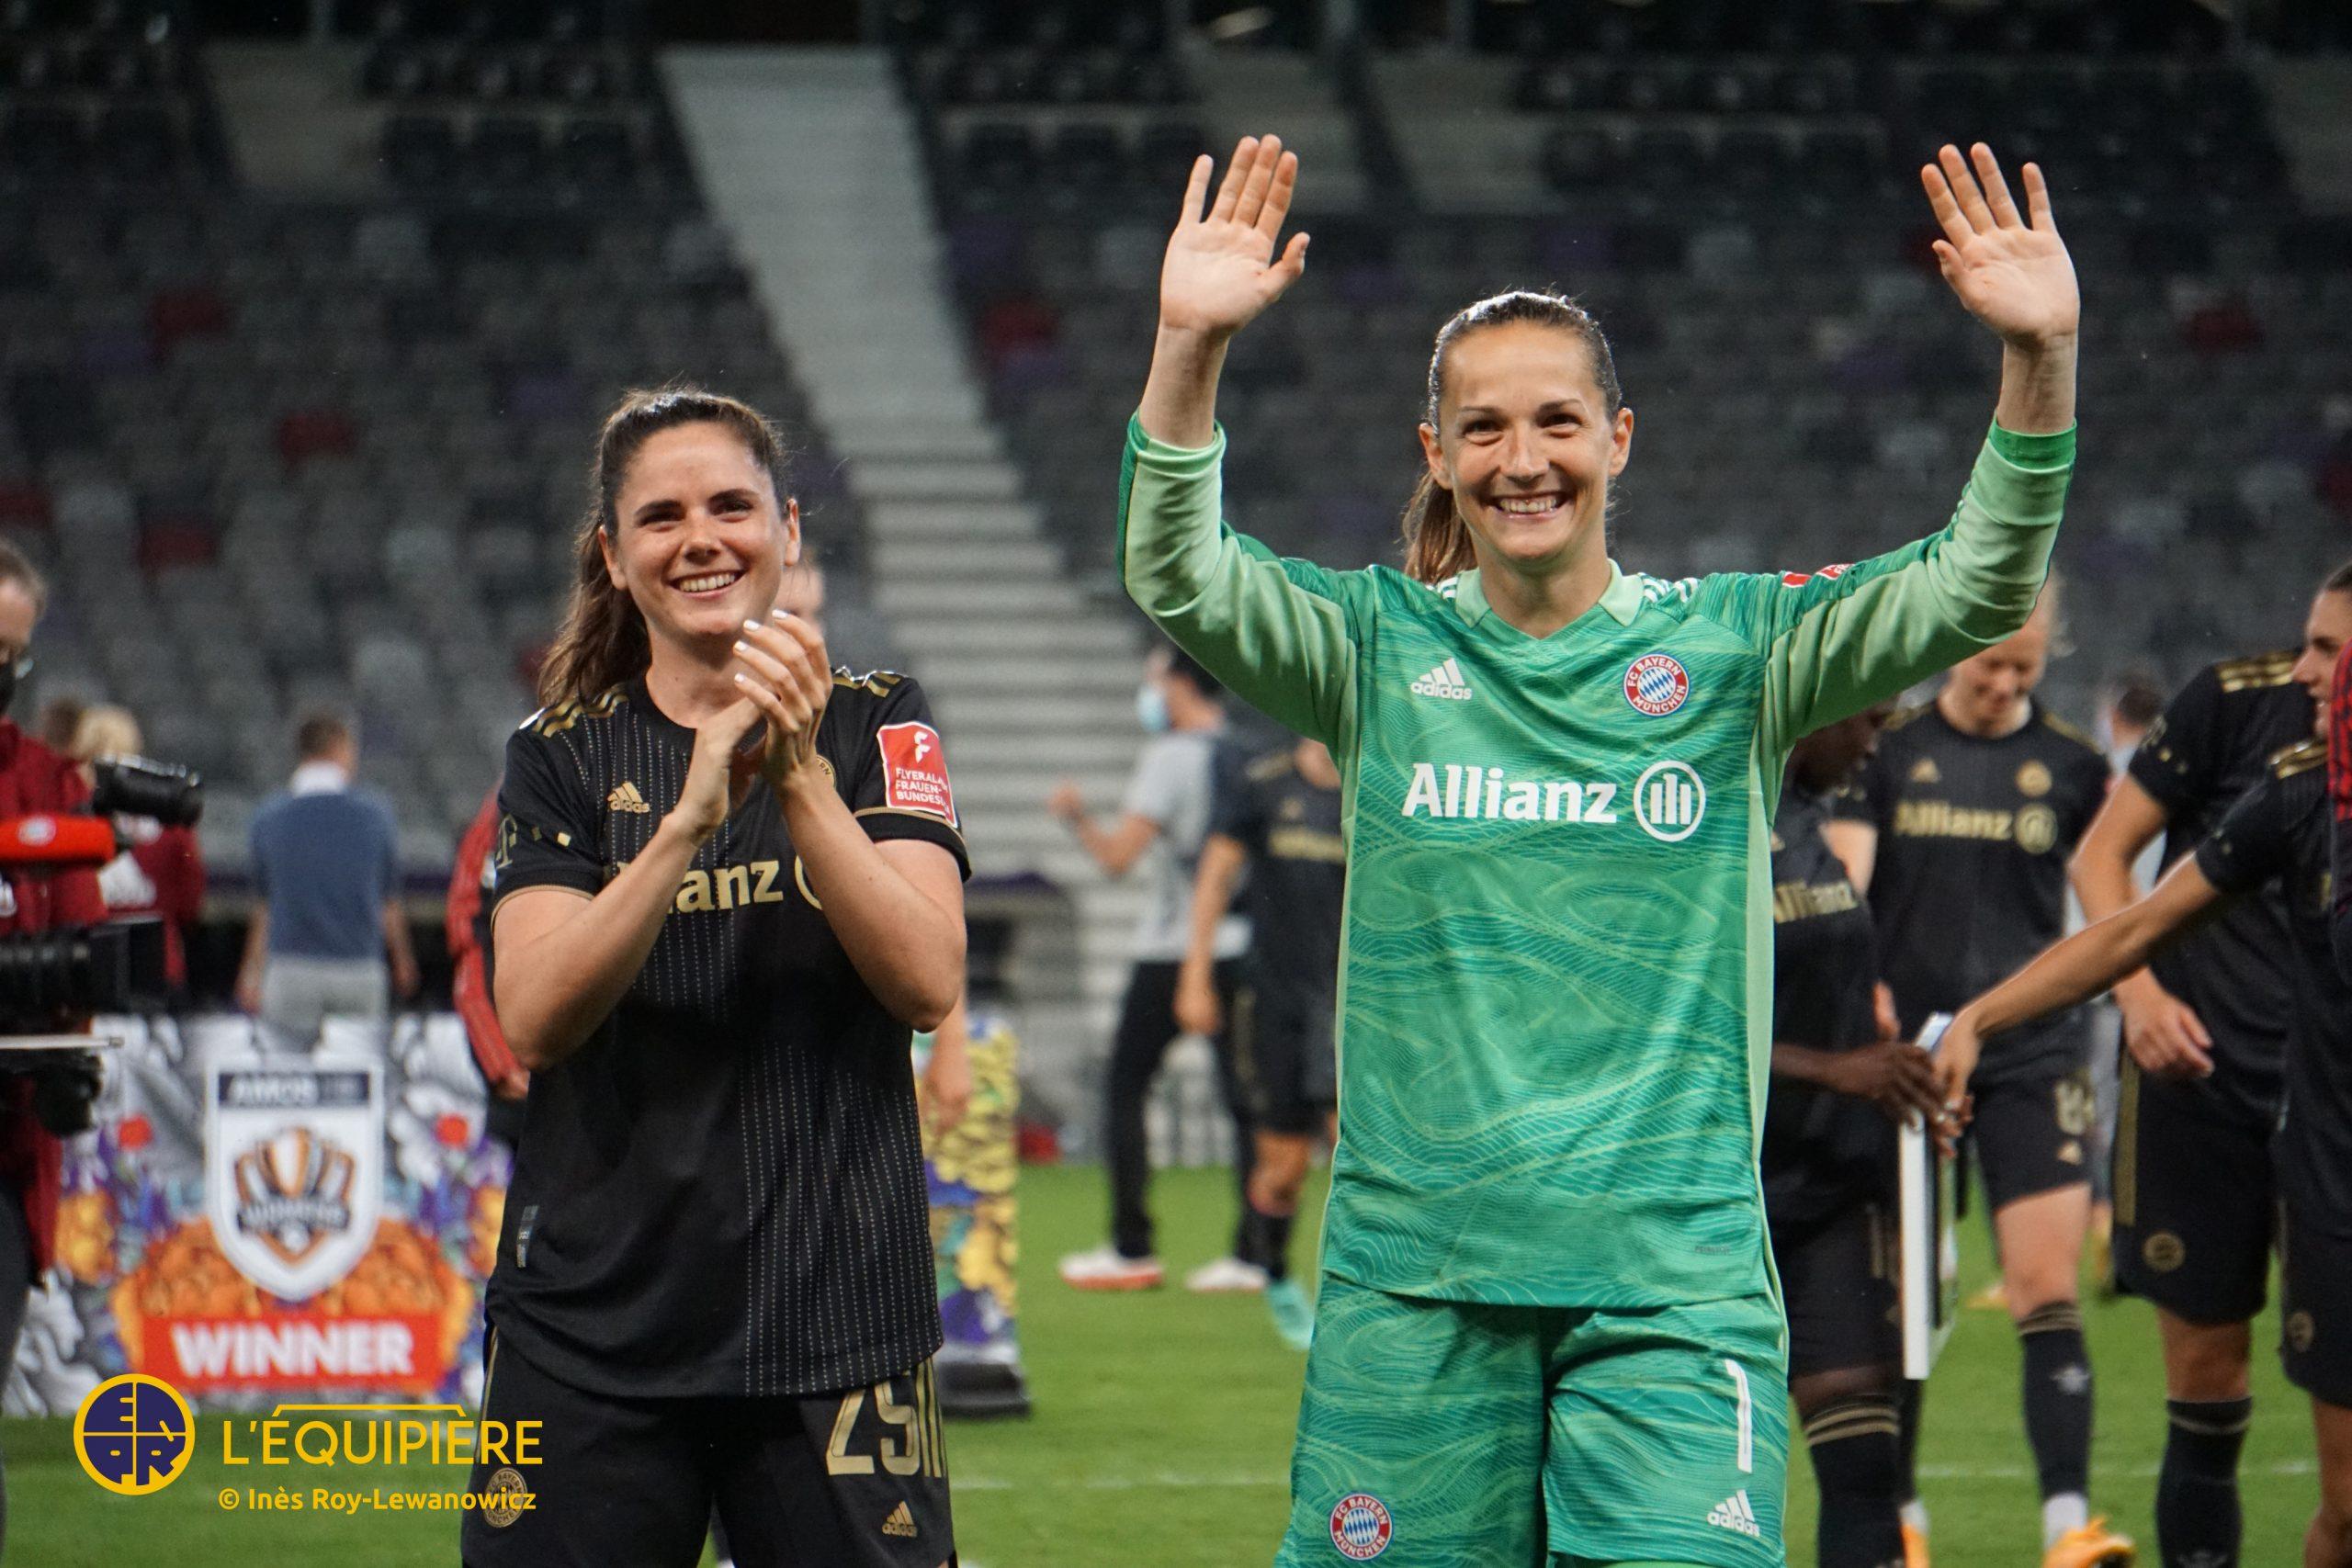 Bayern victoire Amos Cup - Zadrazil - Benkarth